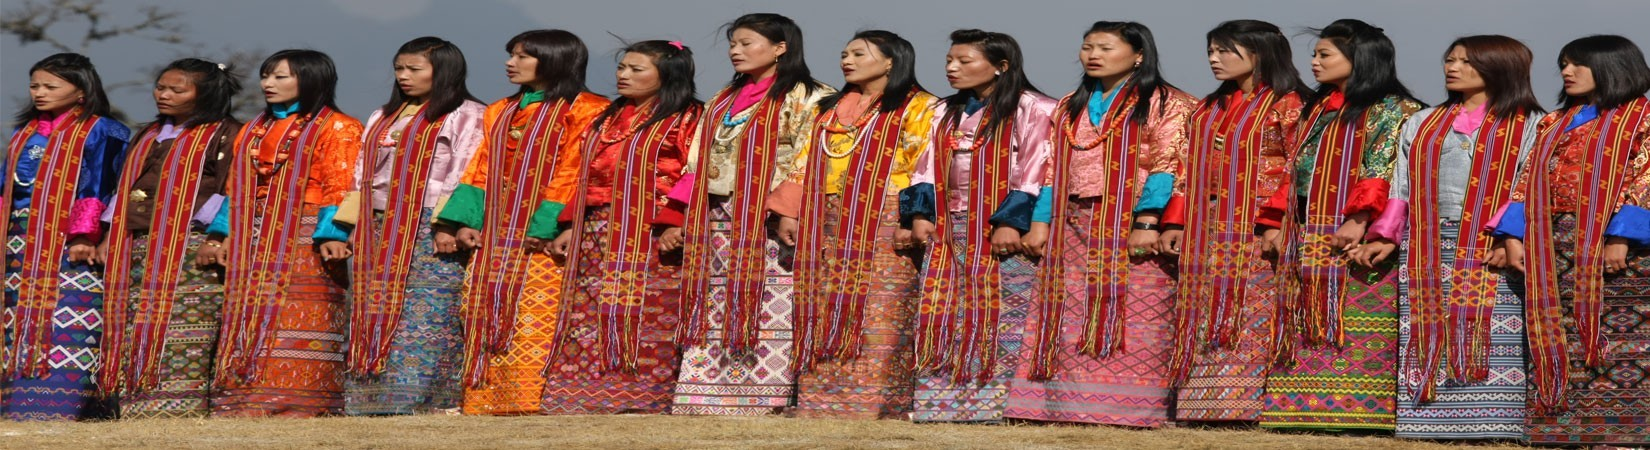 KIRA; National Dress for Women of Bhutan